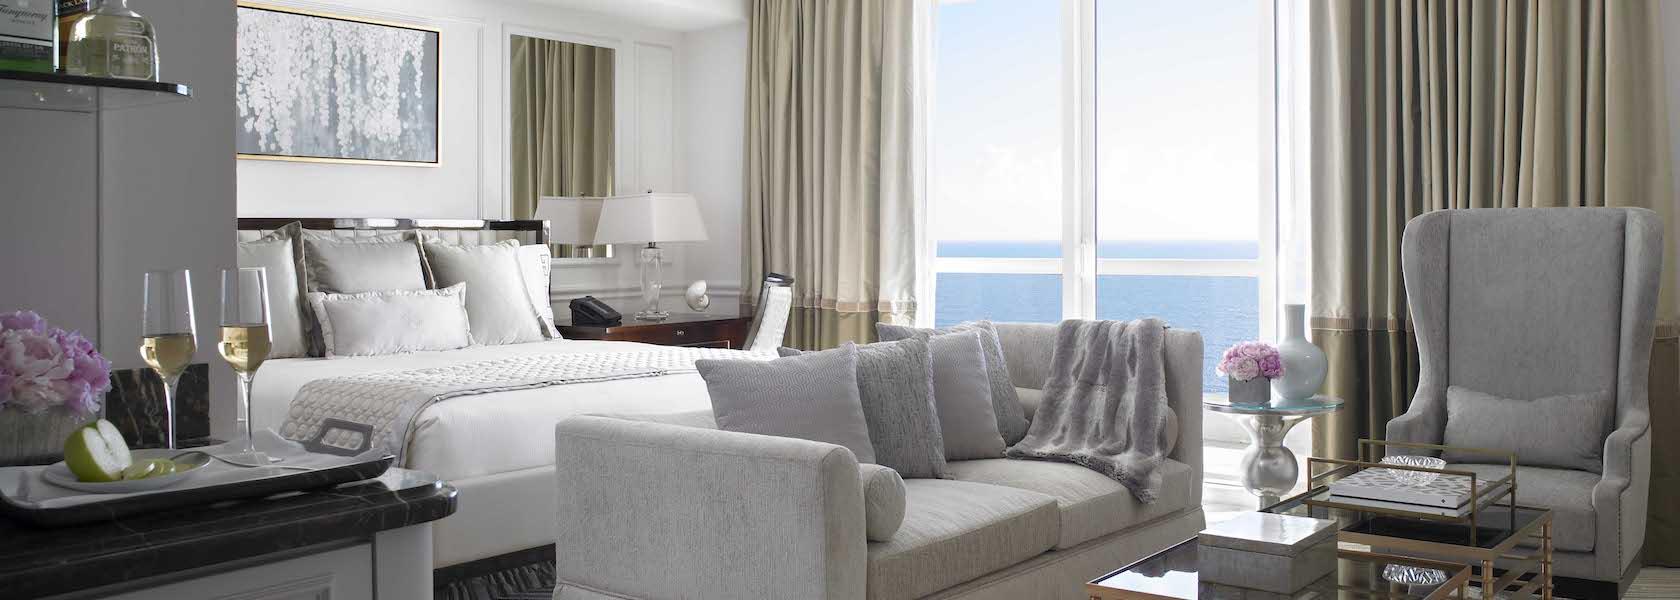 Acqualina Oceanfront Room